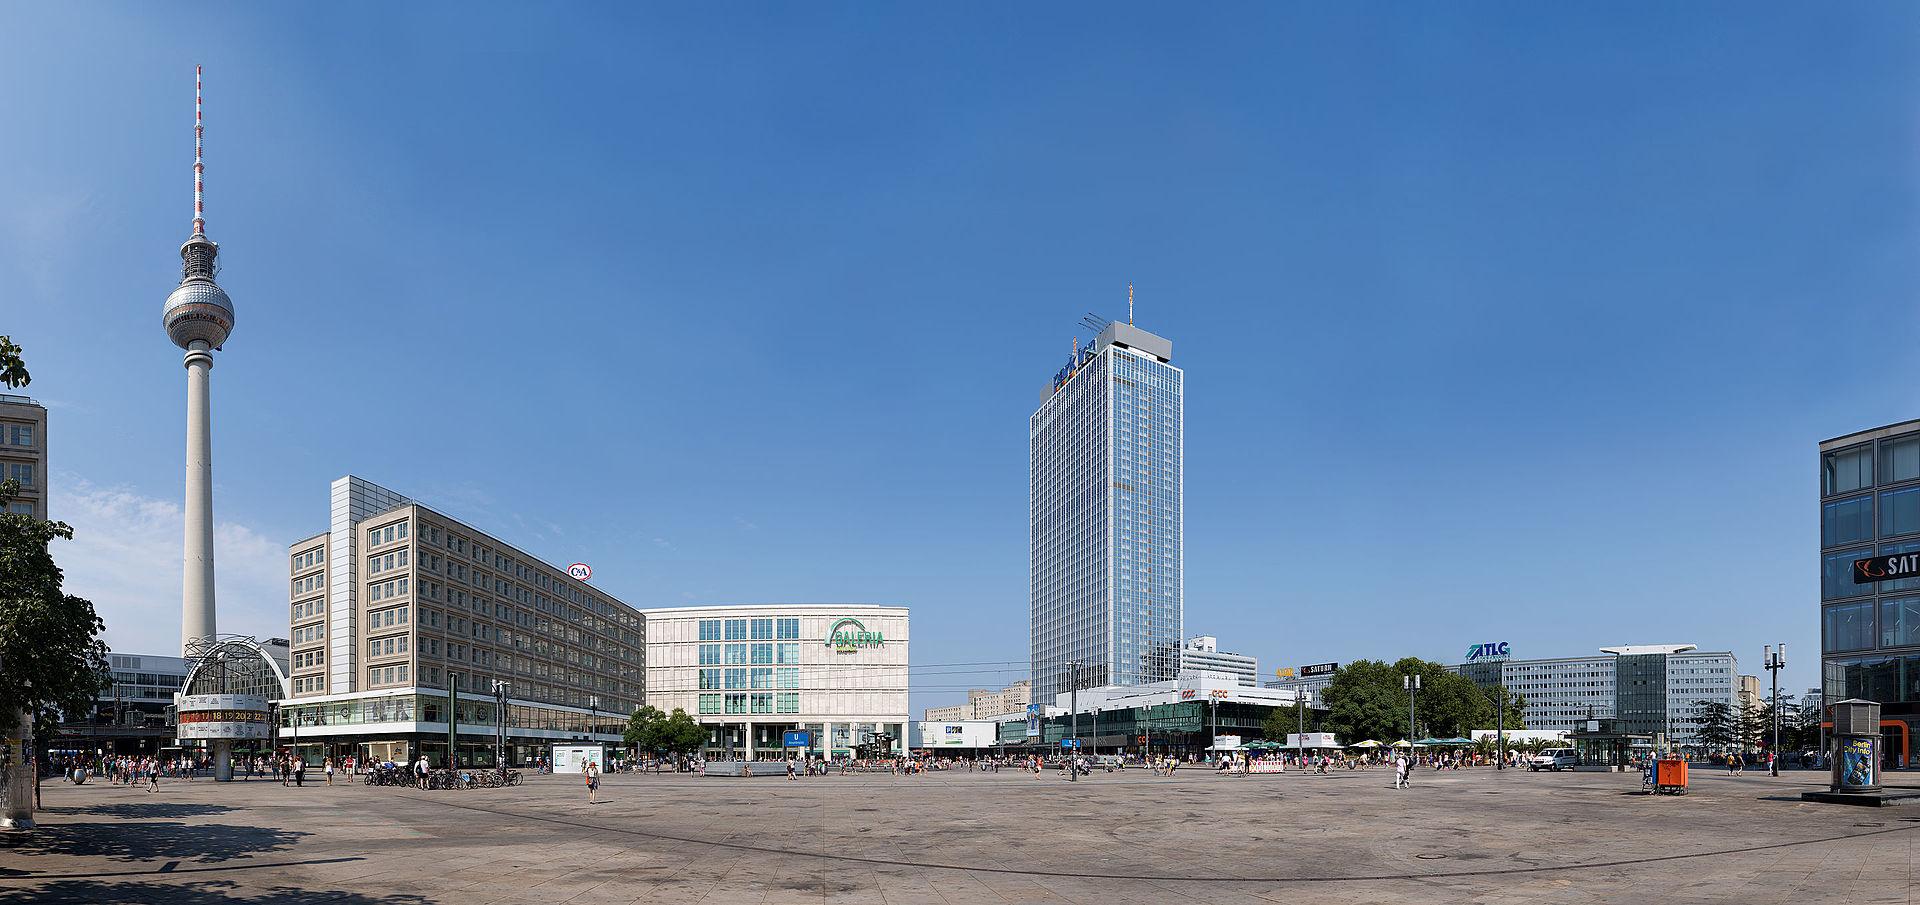 Bild Alexanderplatz